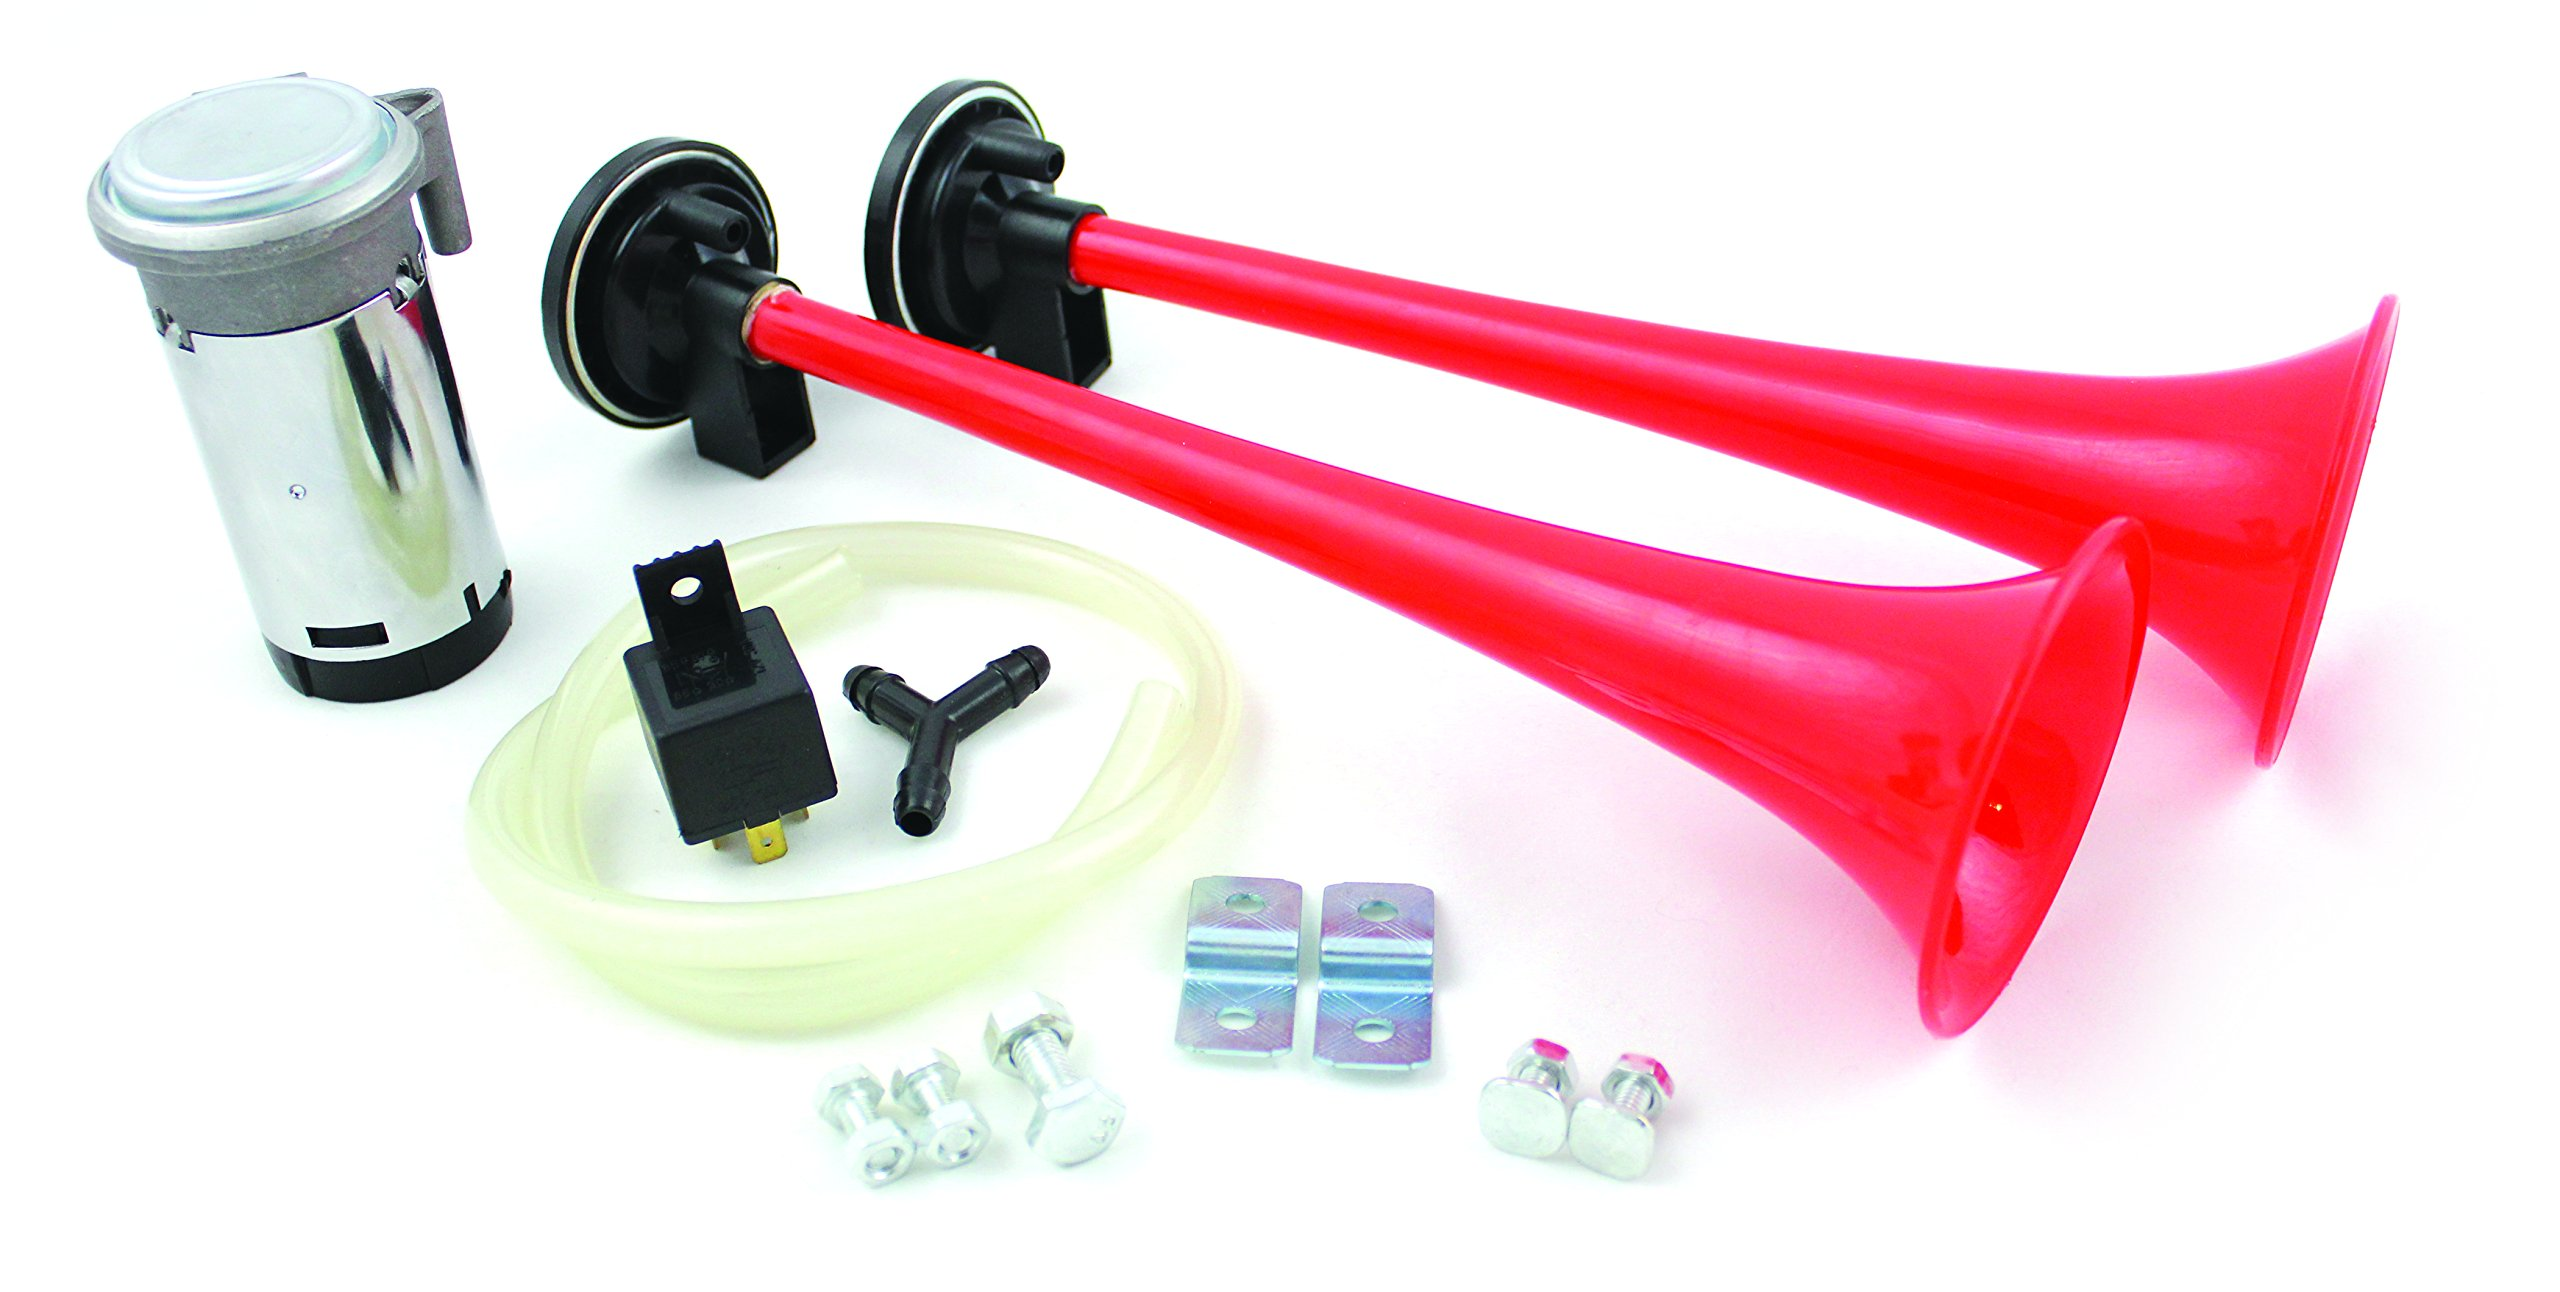 FIAMM 66040'' Big Boss 2 Long Trumpet Horns w/HVY Duty 12 V Compressor Kit, 10 Pack